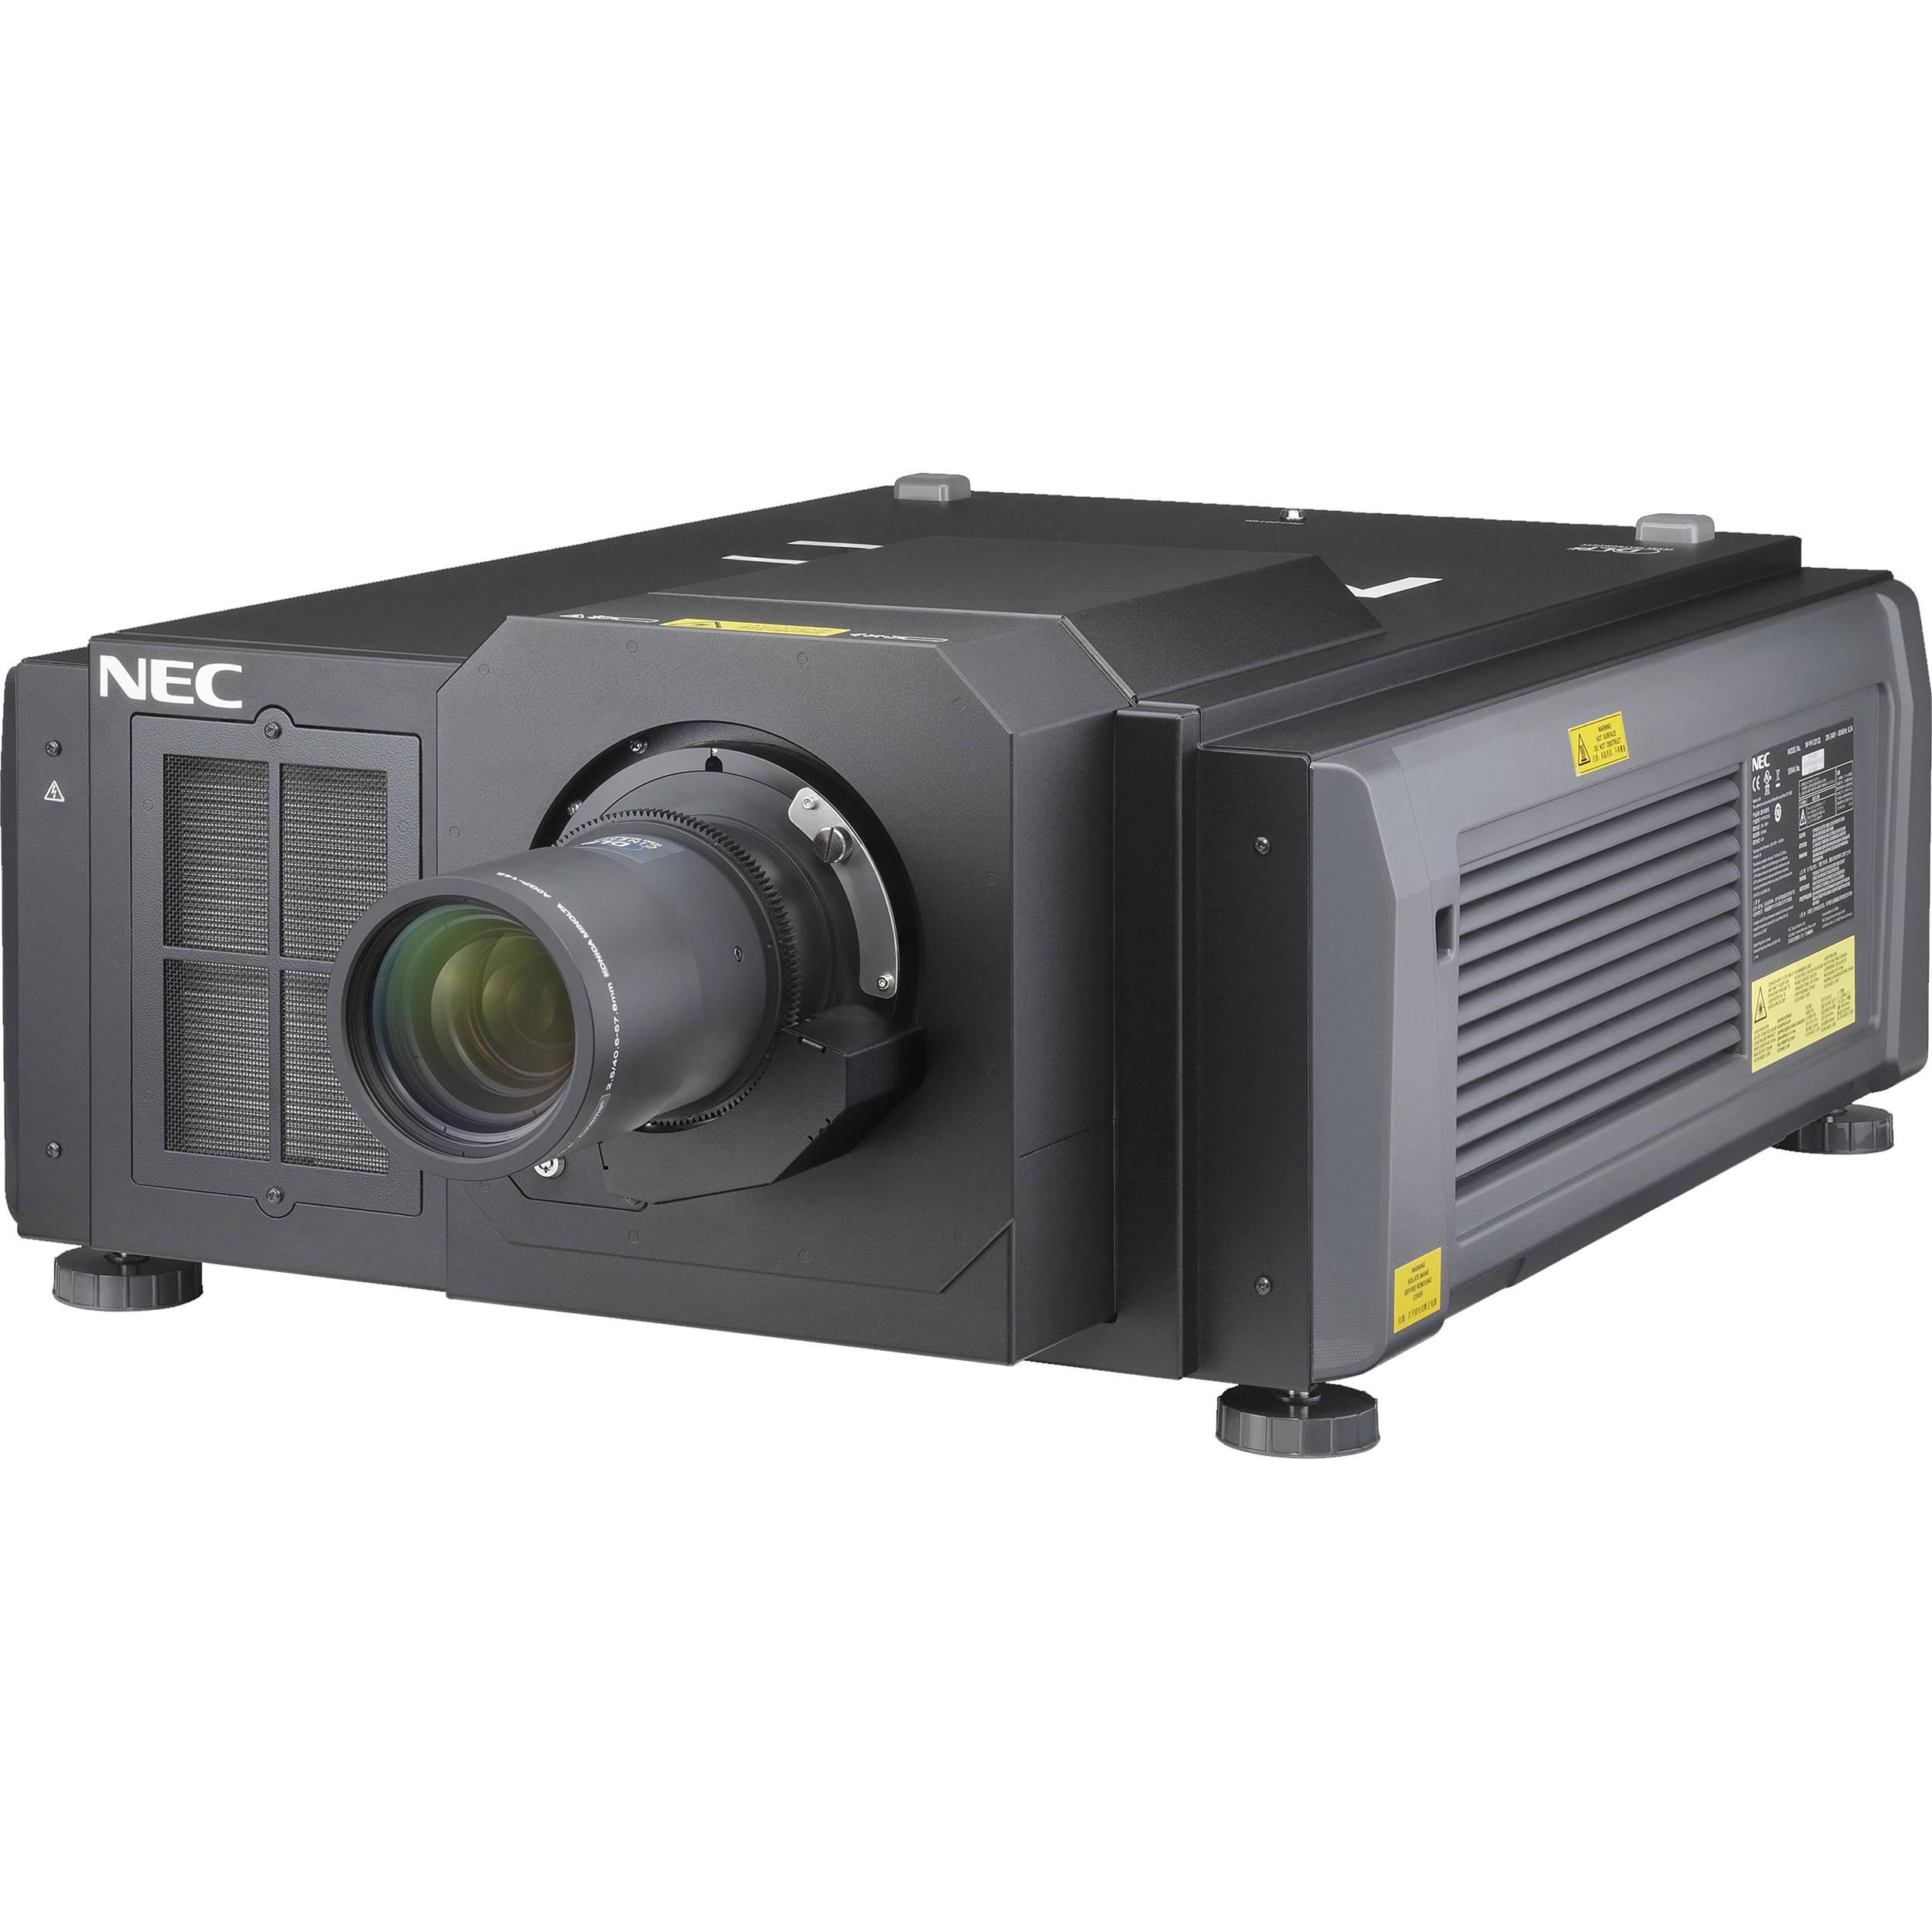 NEC NP-PH1201QL 12,000-Lumen 4K Laser Phosphor Installati...